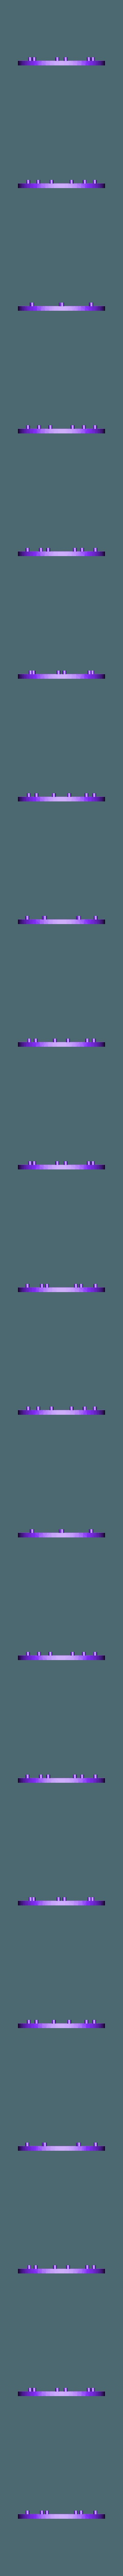 Slotted Disc, Hidden Symbol Iris Ring.STL Download free STL file Hidden Symbol Iris Ring • 3D printer model, potentprintables